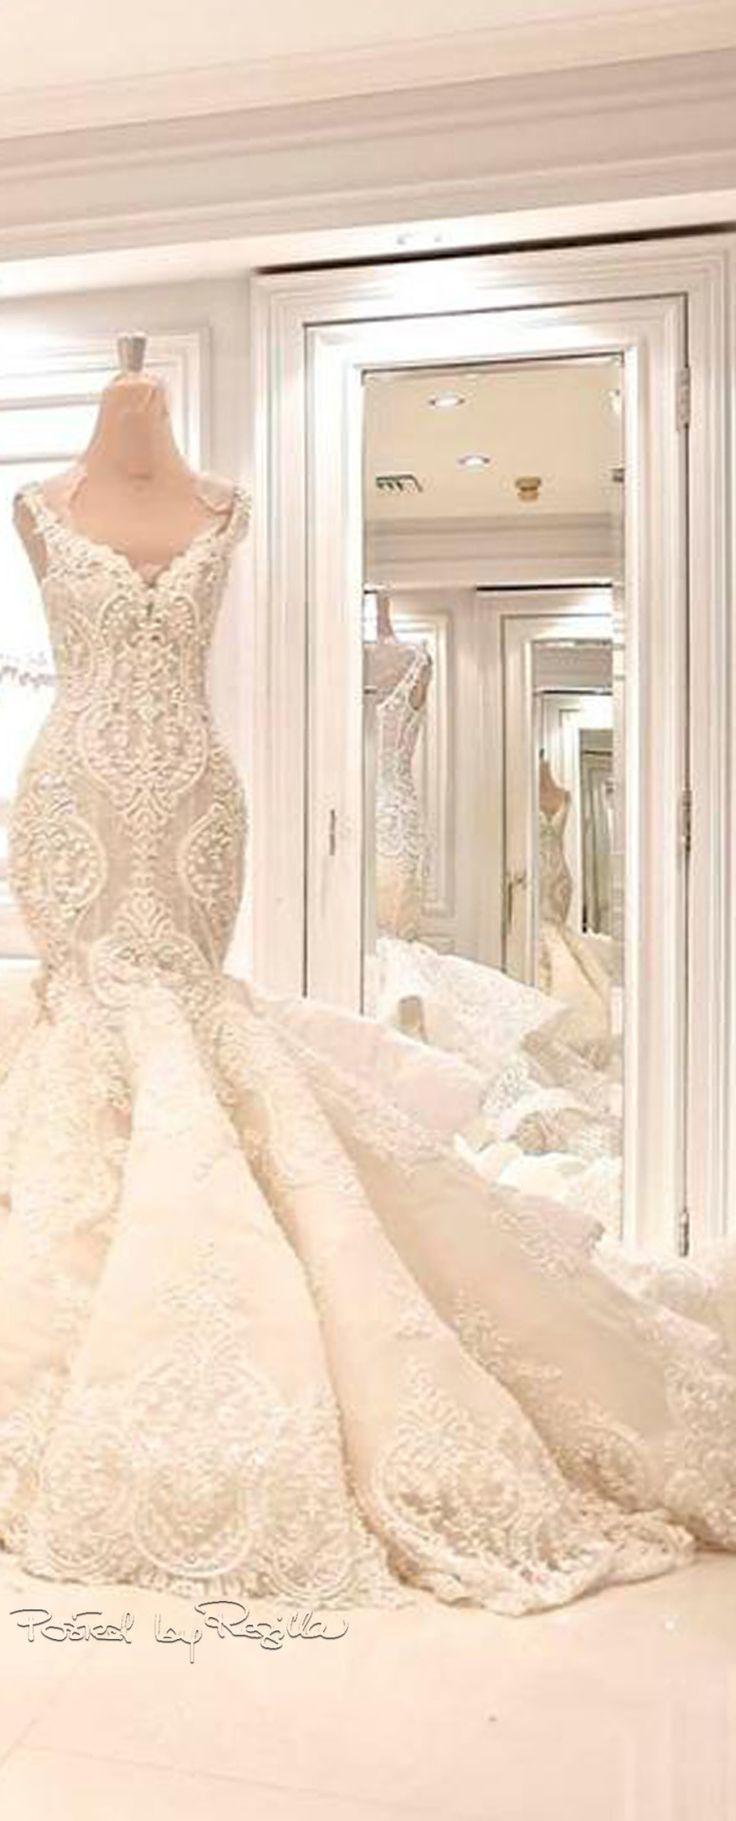 Regilla ⚜ Jacy Kay, bridal-gown-spring-2016 ★★@EstellaSeraphim ★★